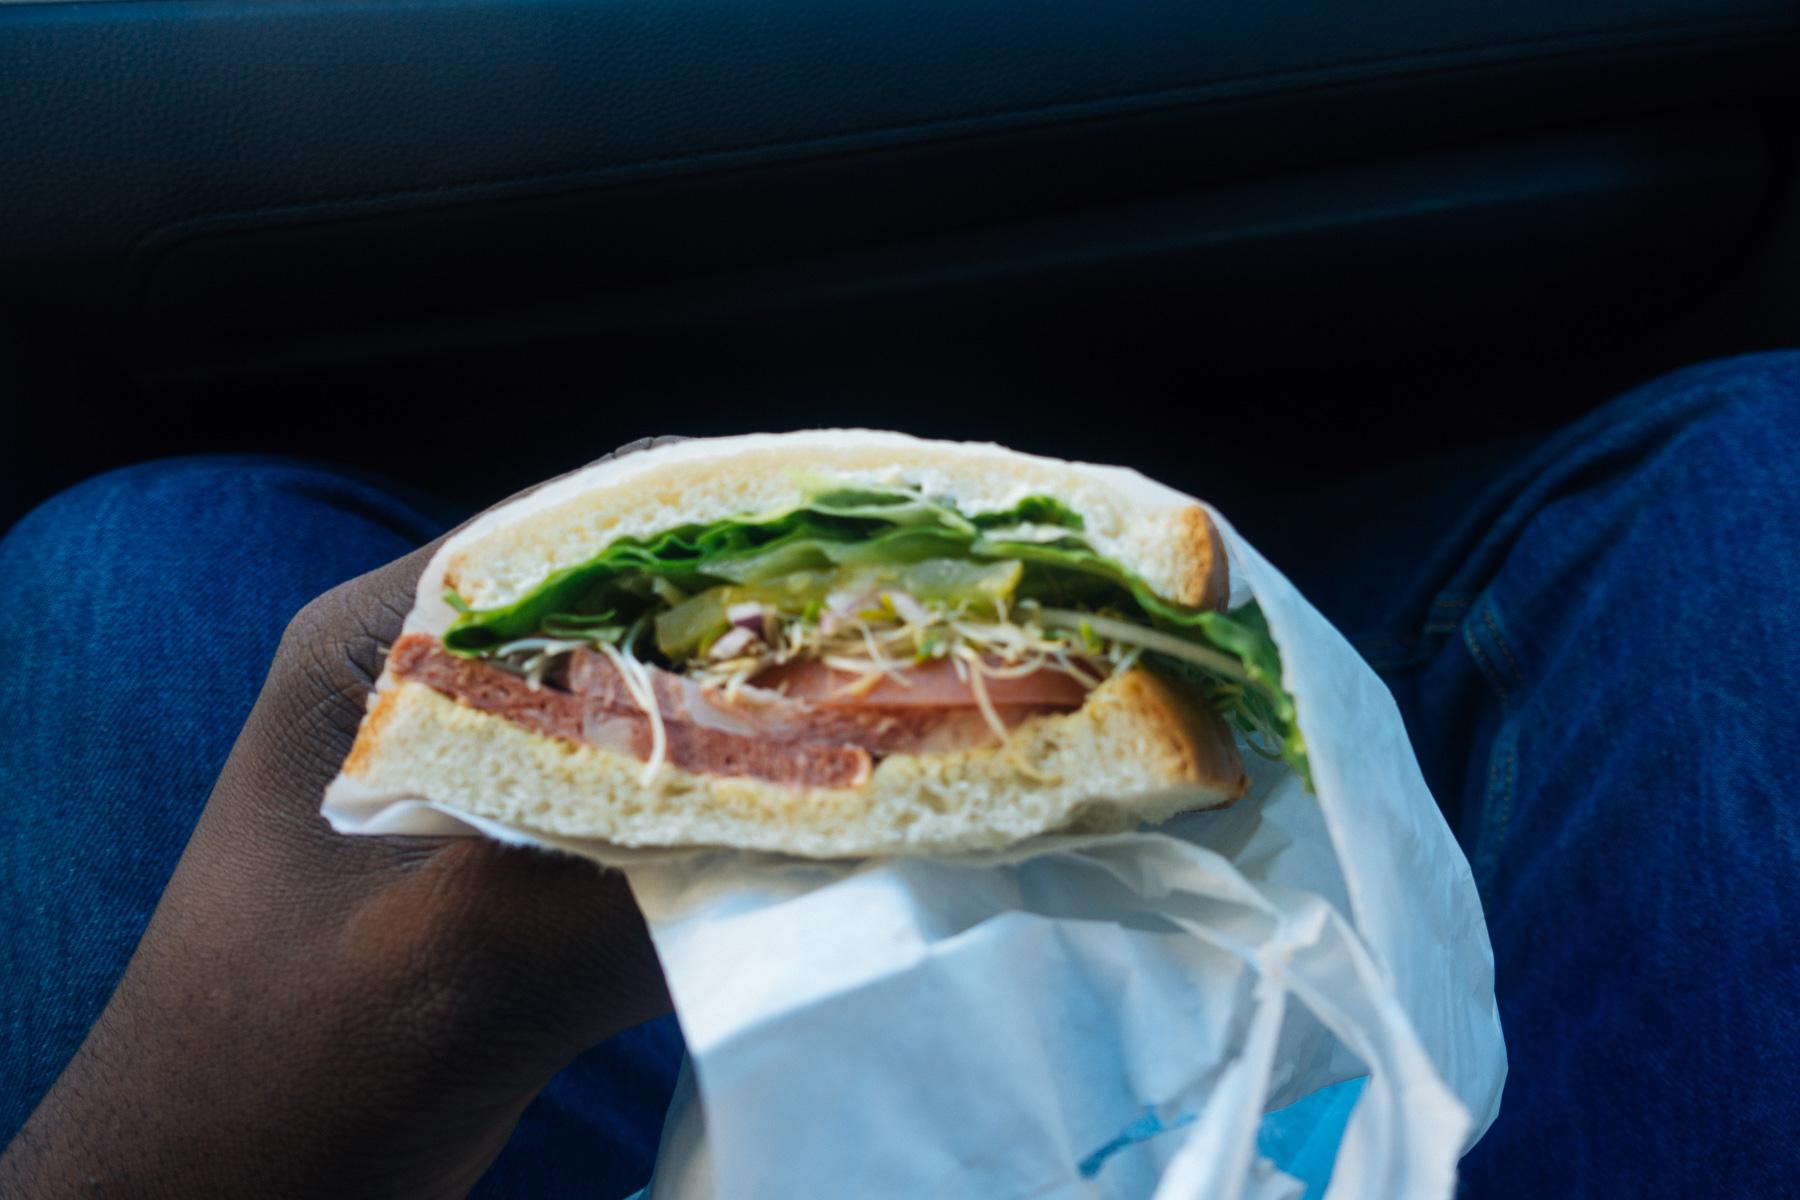 A blurry vegan bacon sandwich